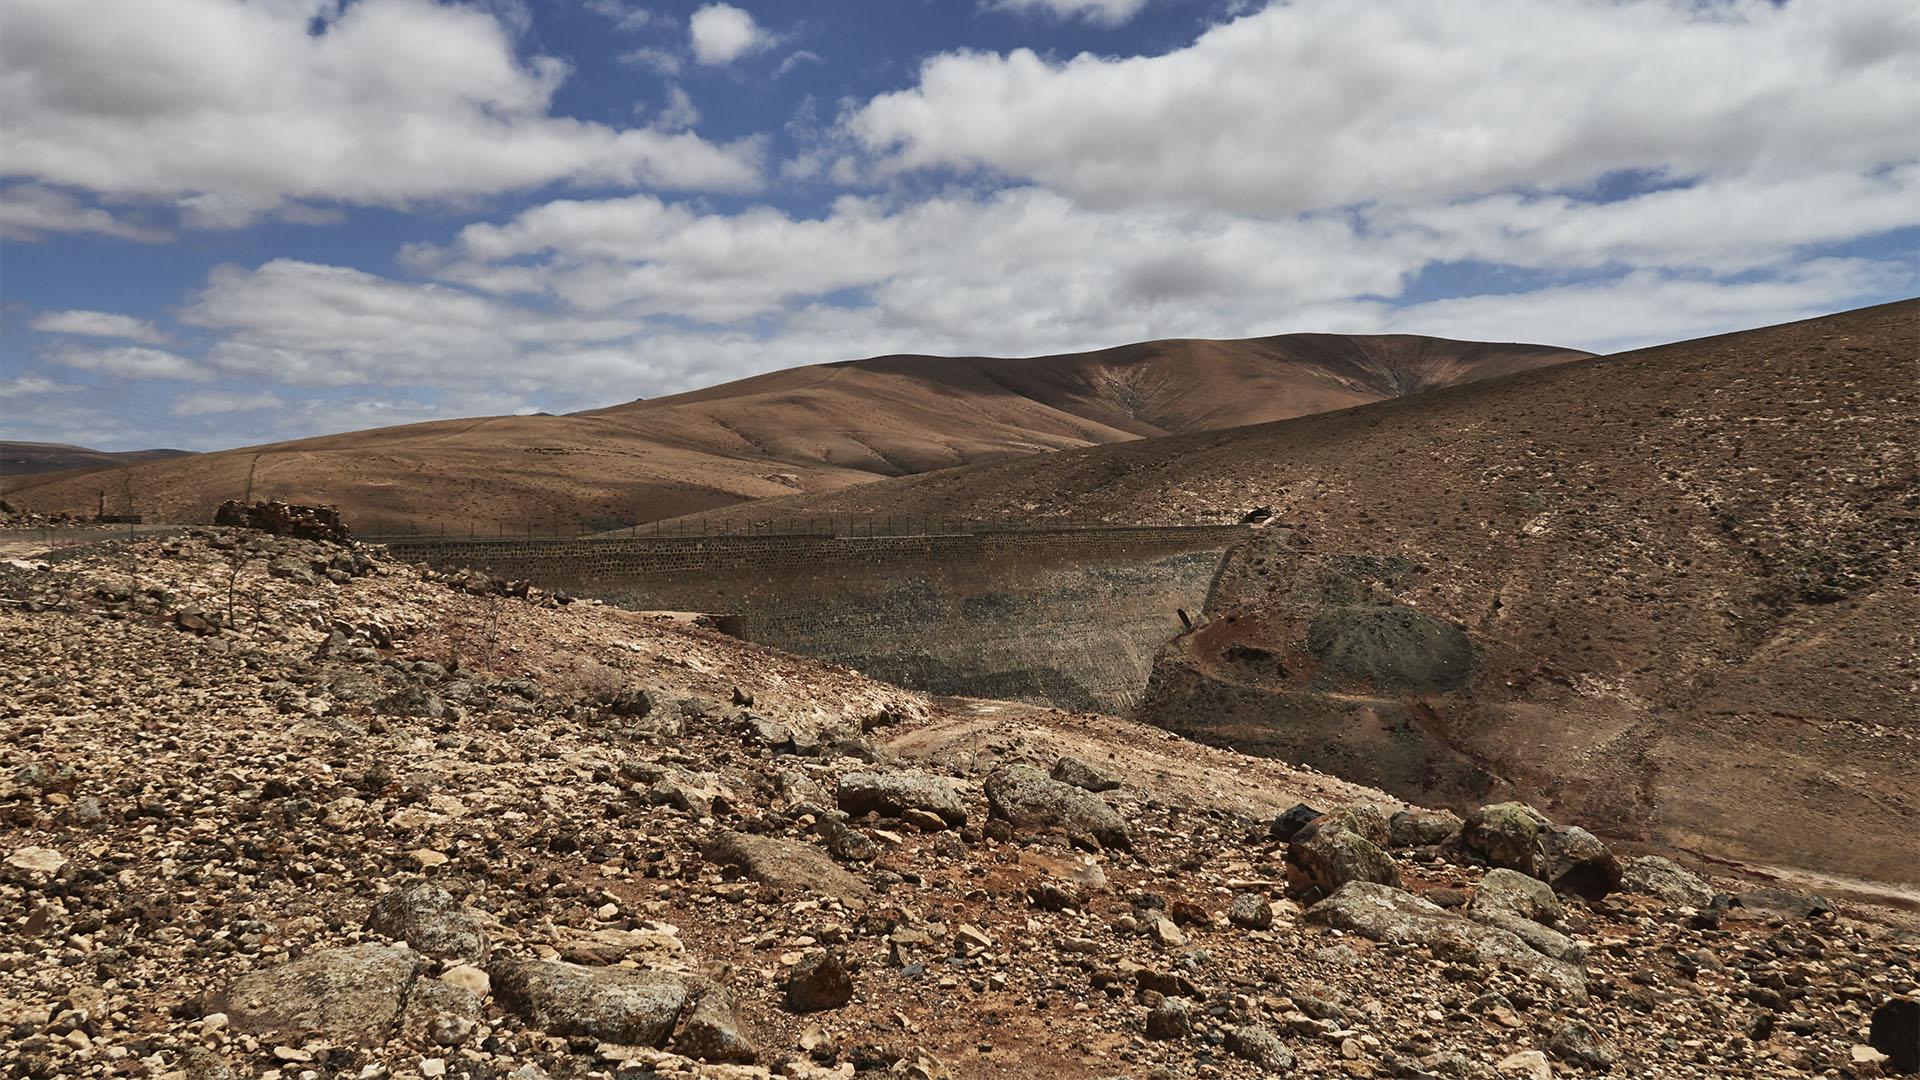 Der Staudamm Embalse de Los Molinos Fuerteventura.